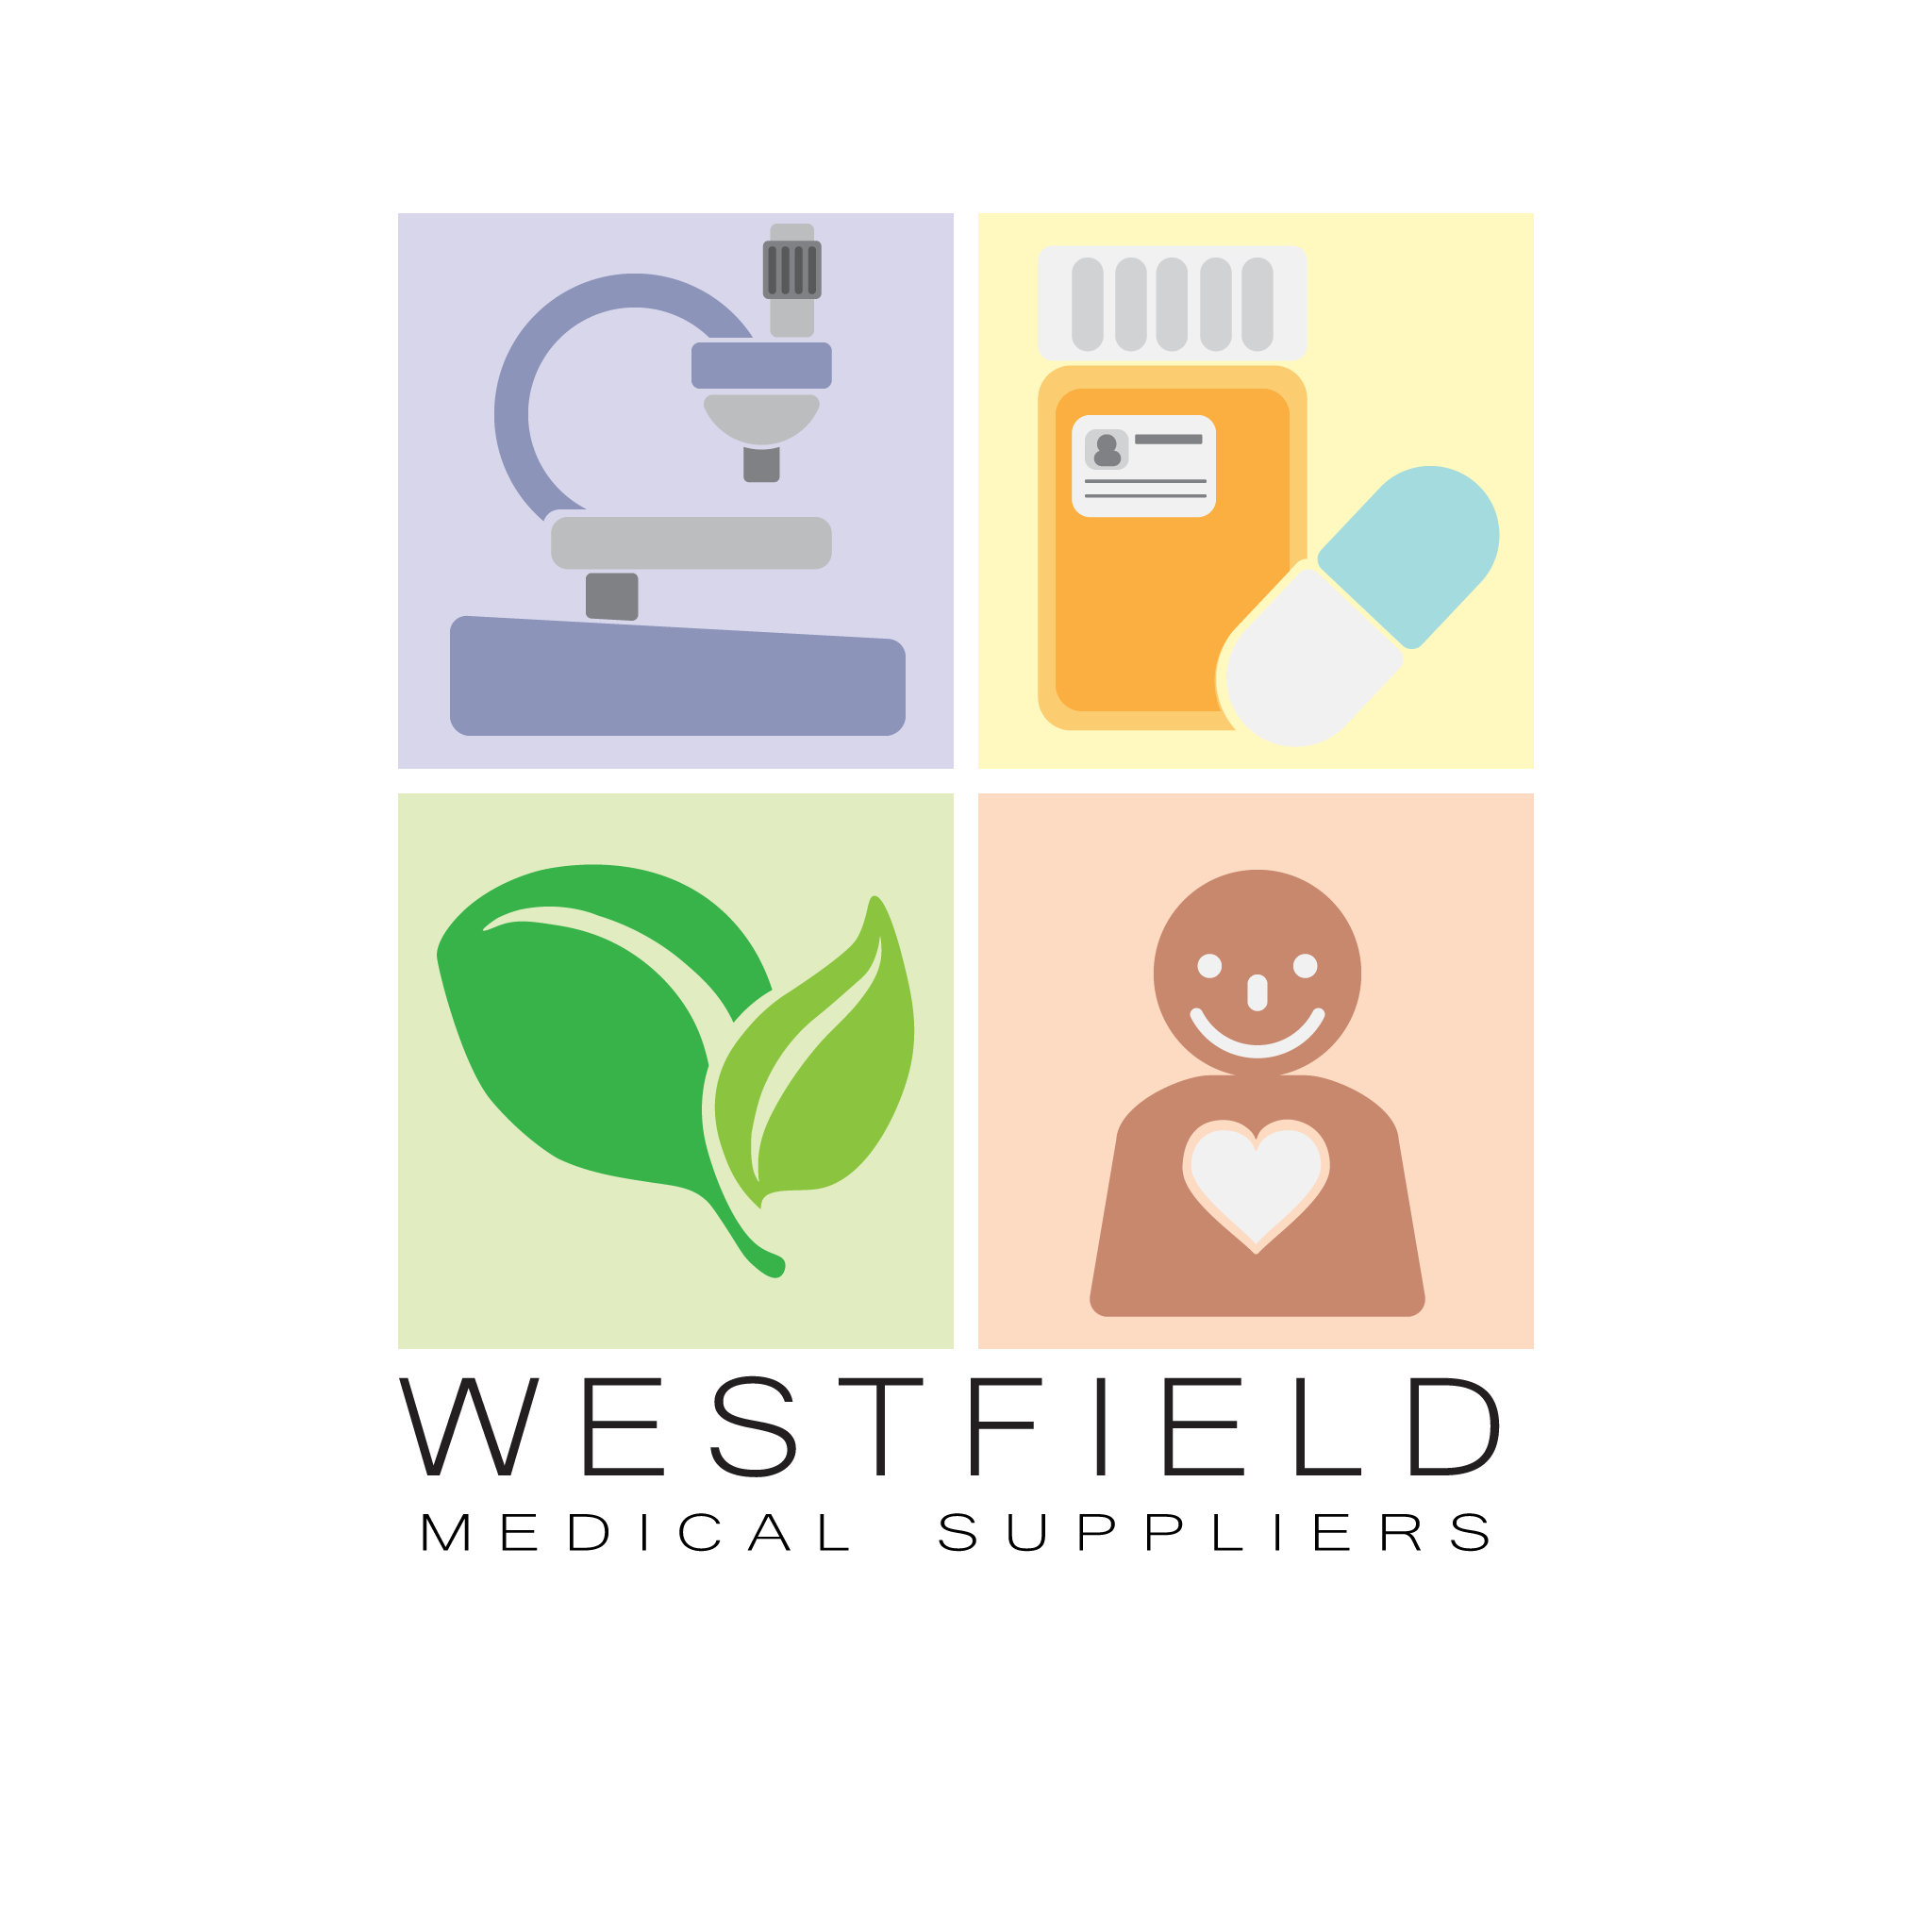 WestfieldMedical_2.png